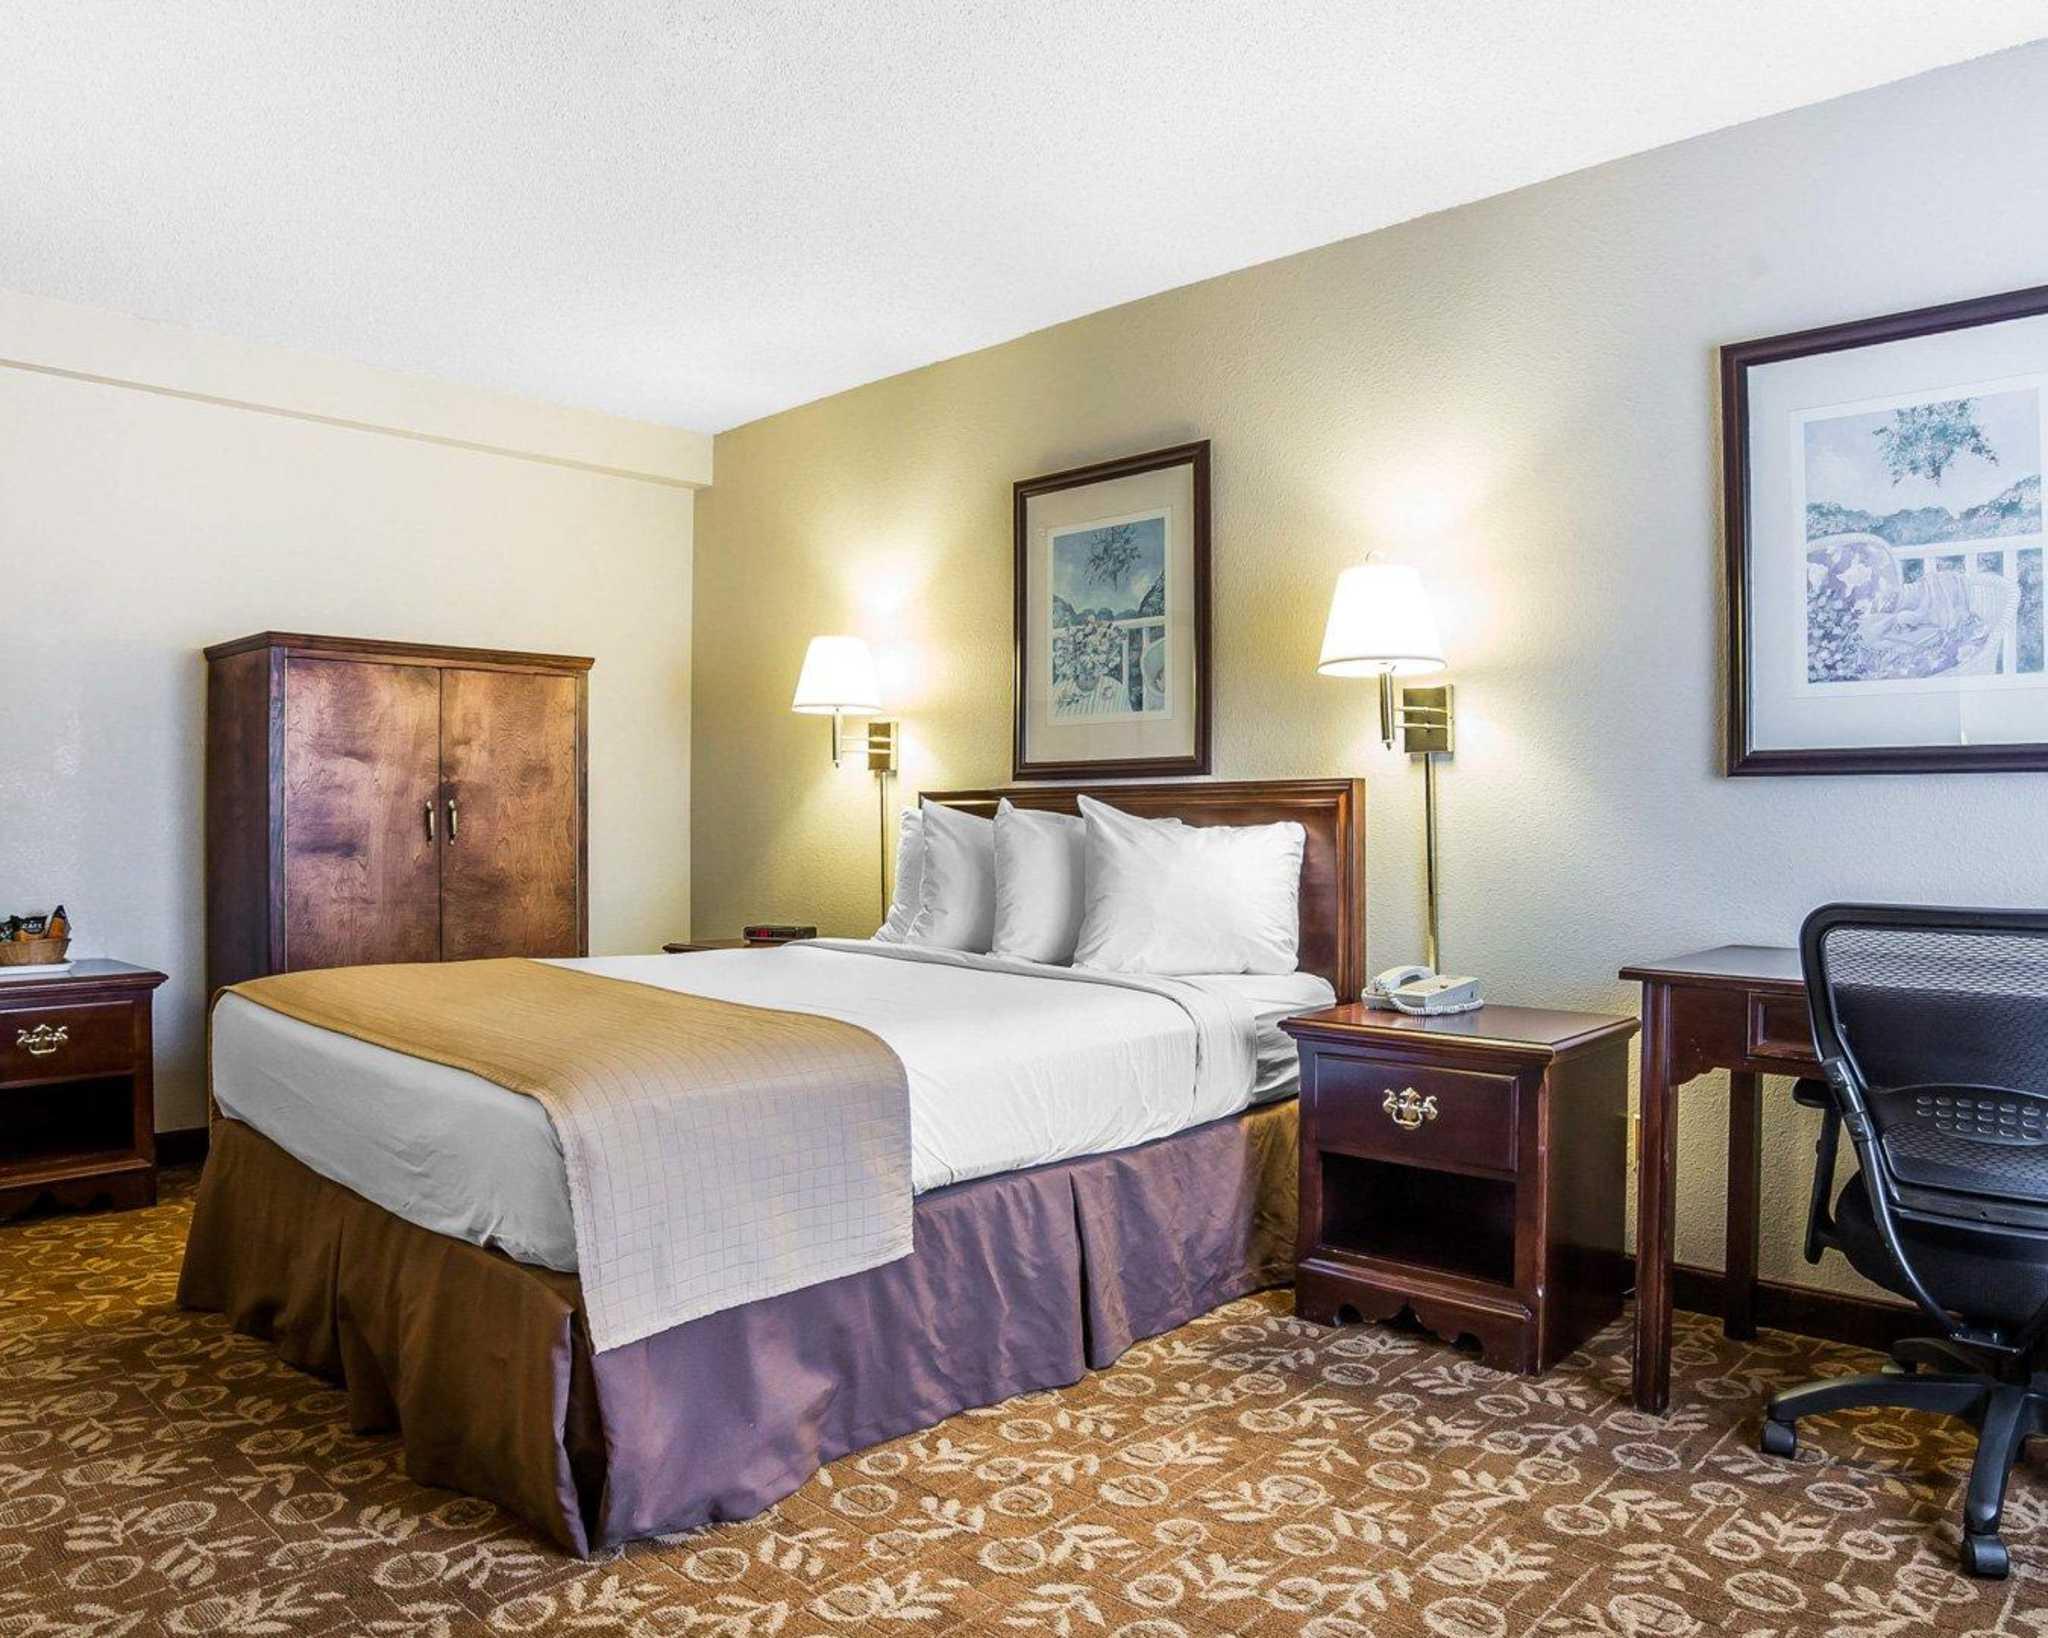 Quality Inn & Suites Minden US-395 image 9